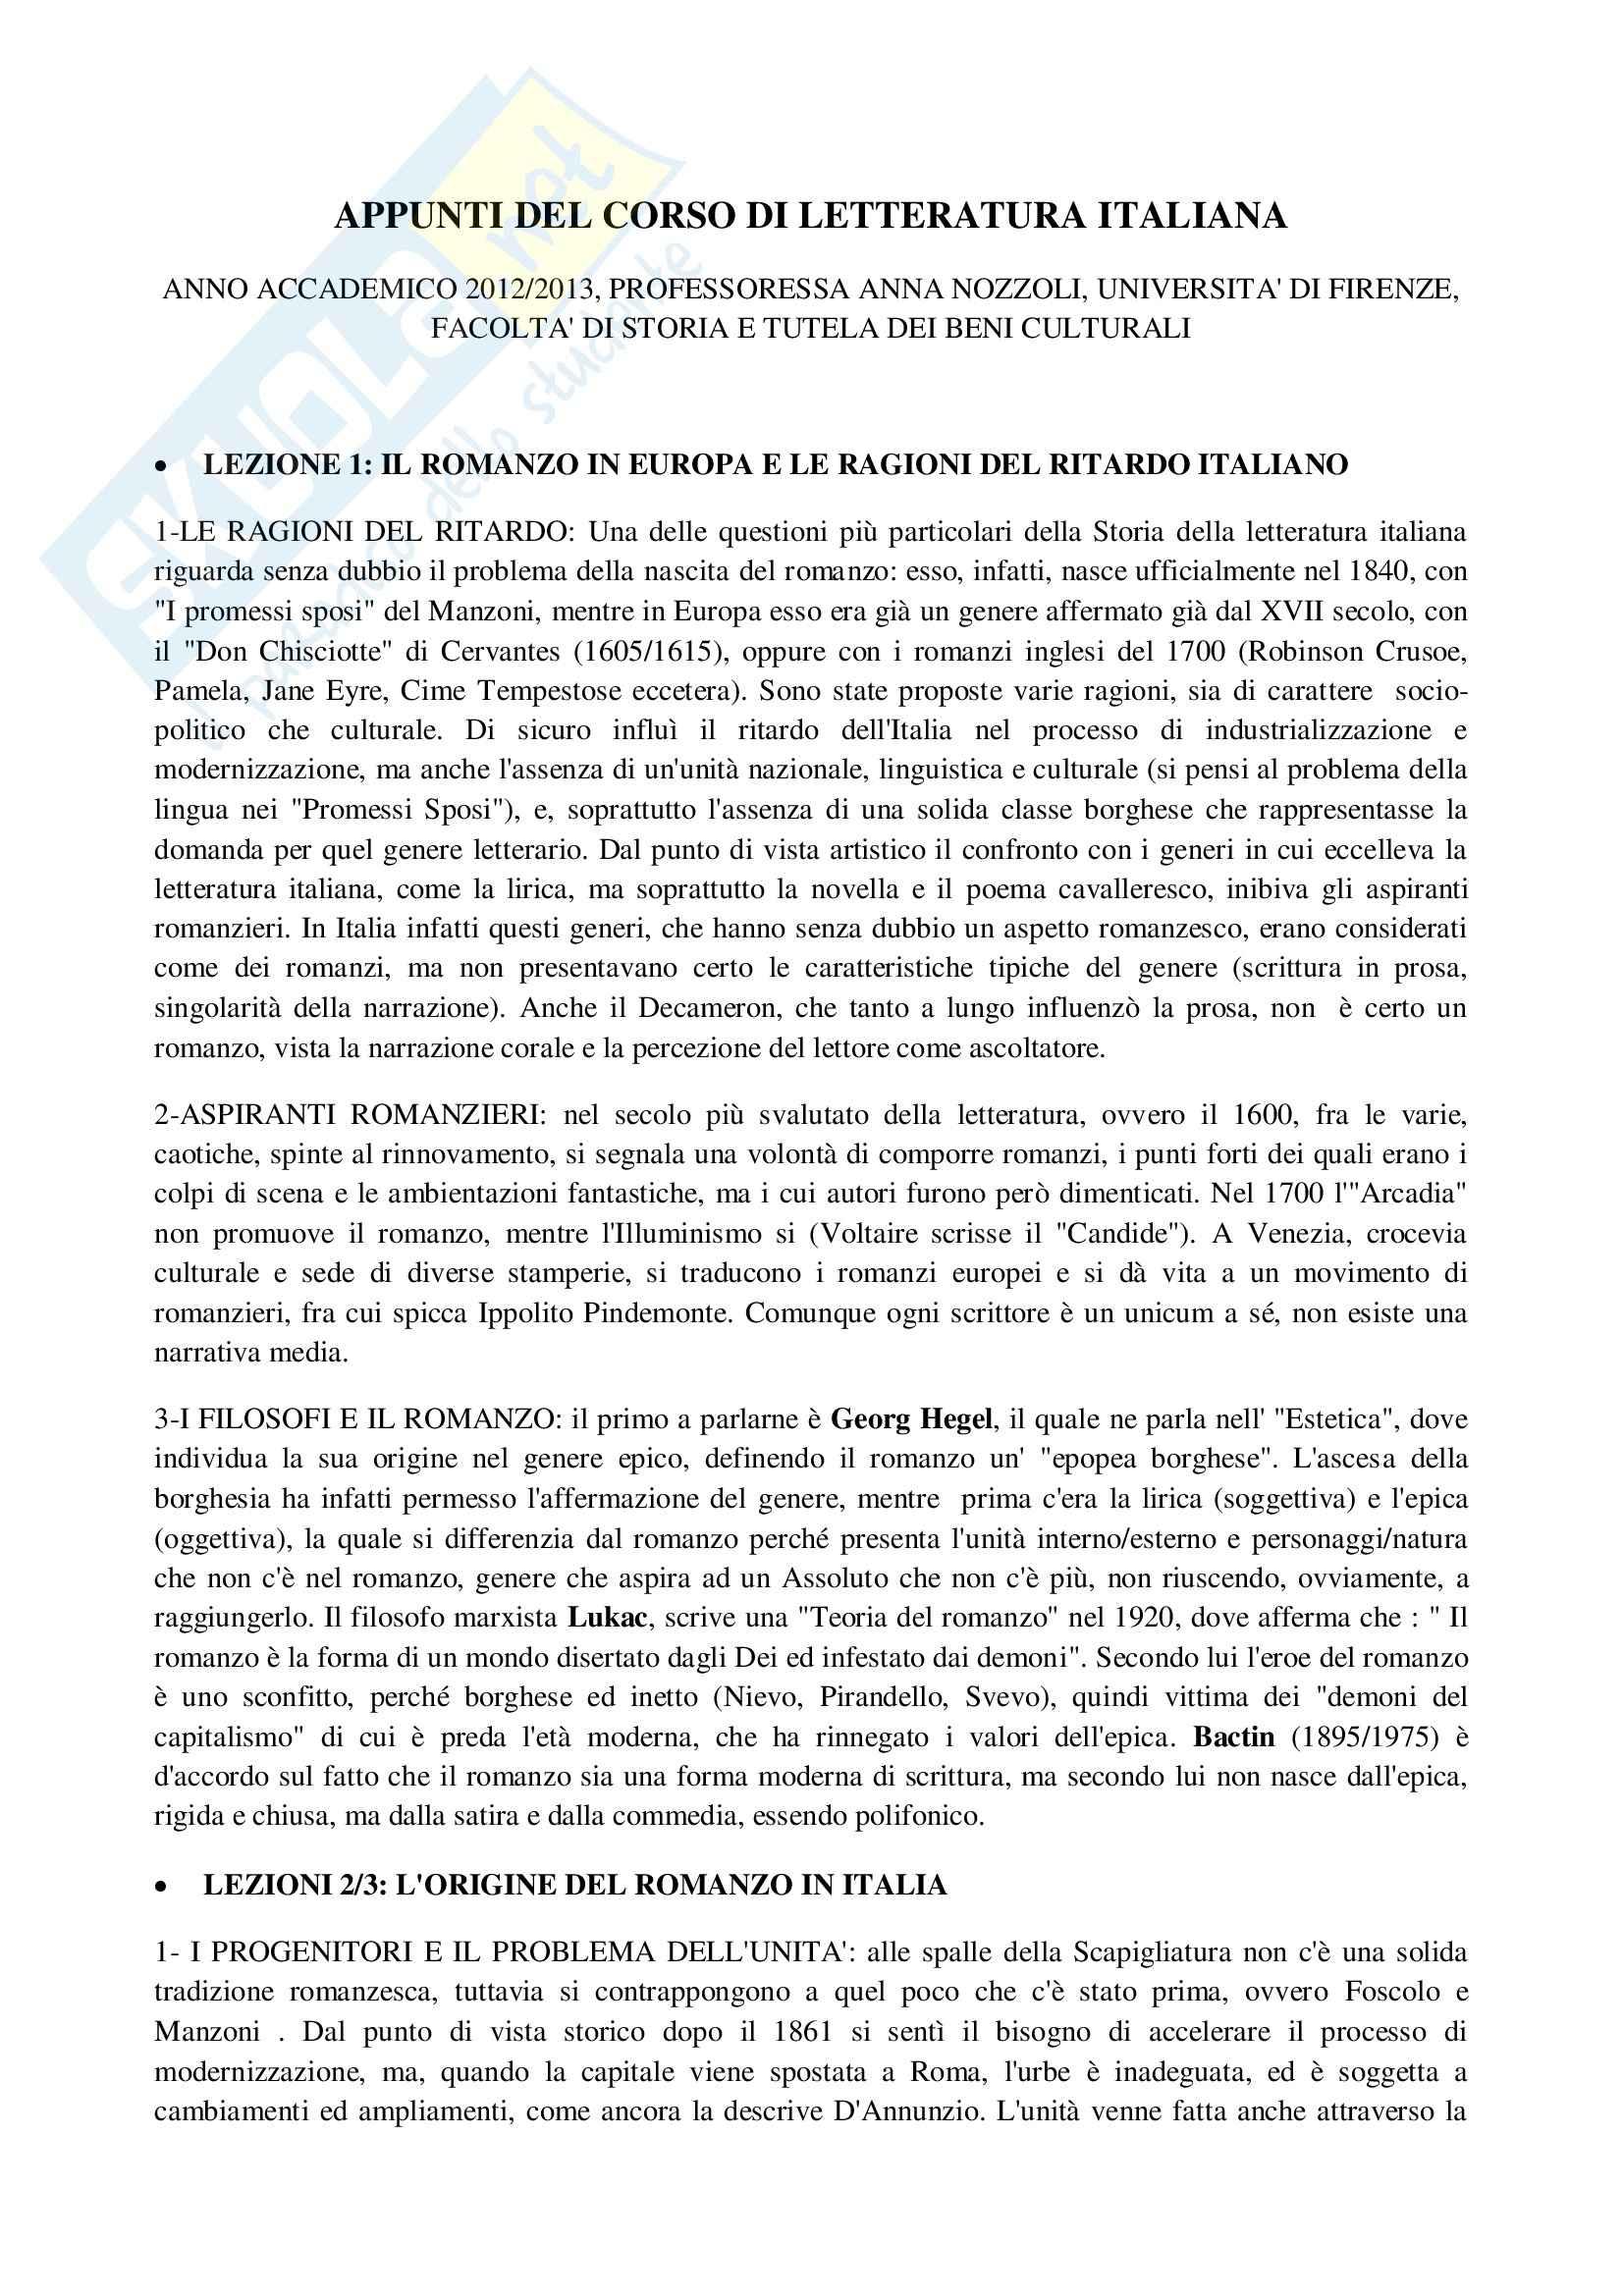 Romanzo italiano, Letteratura italiana